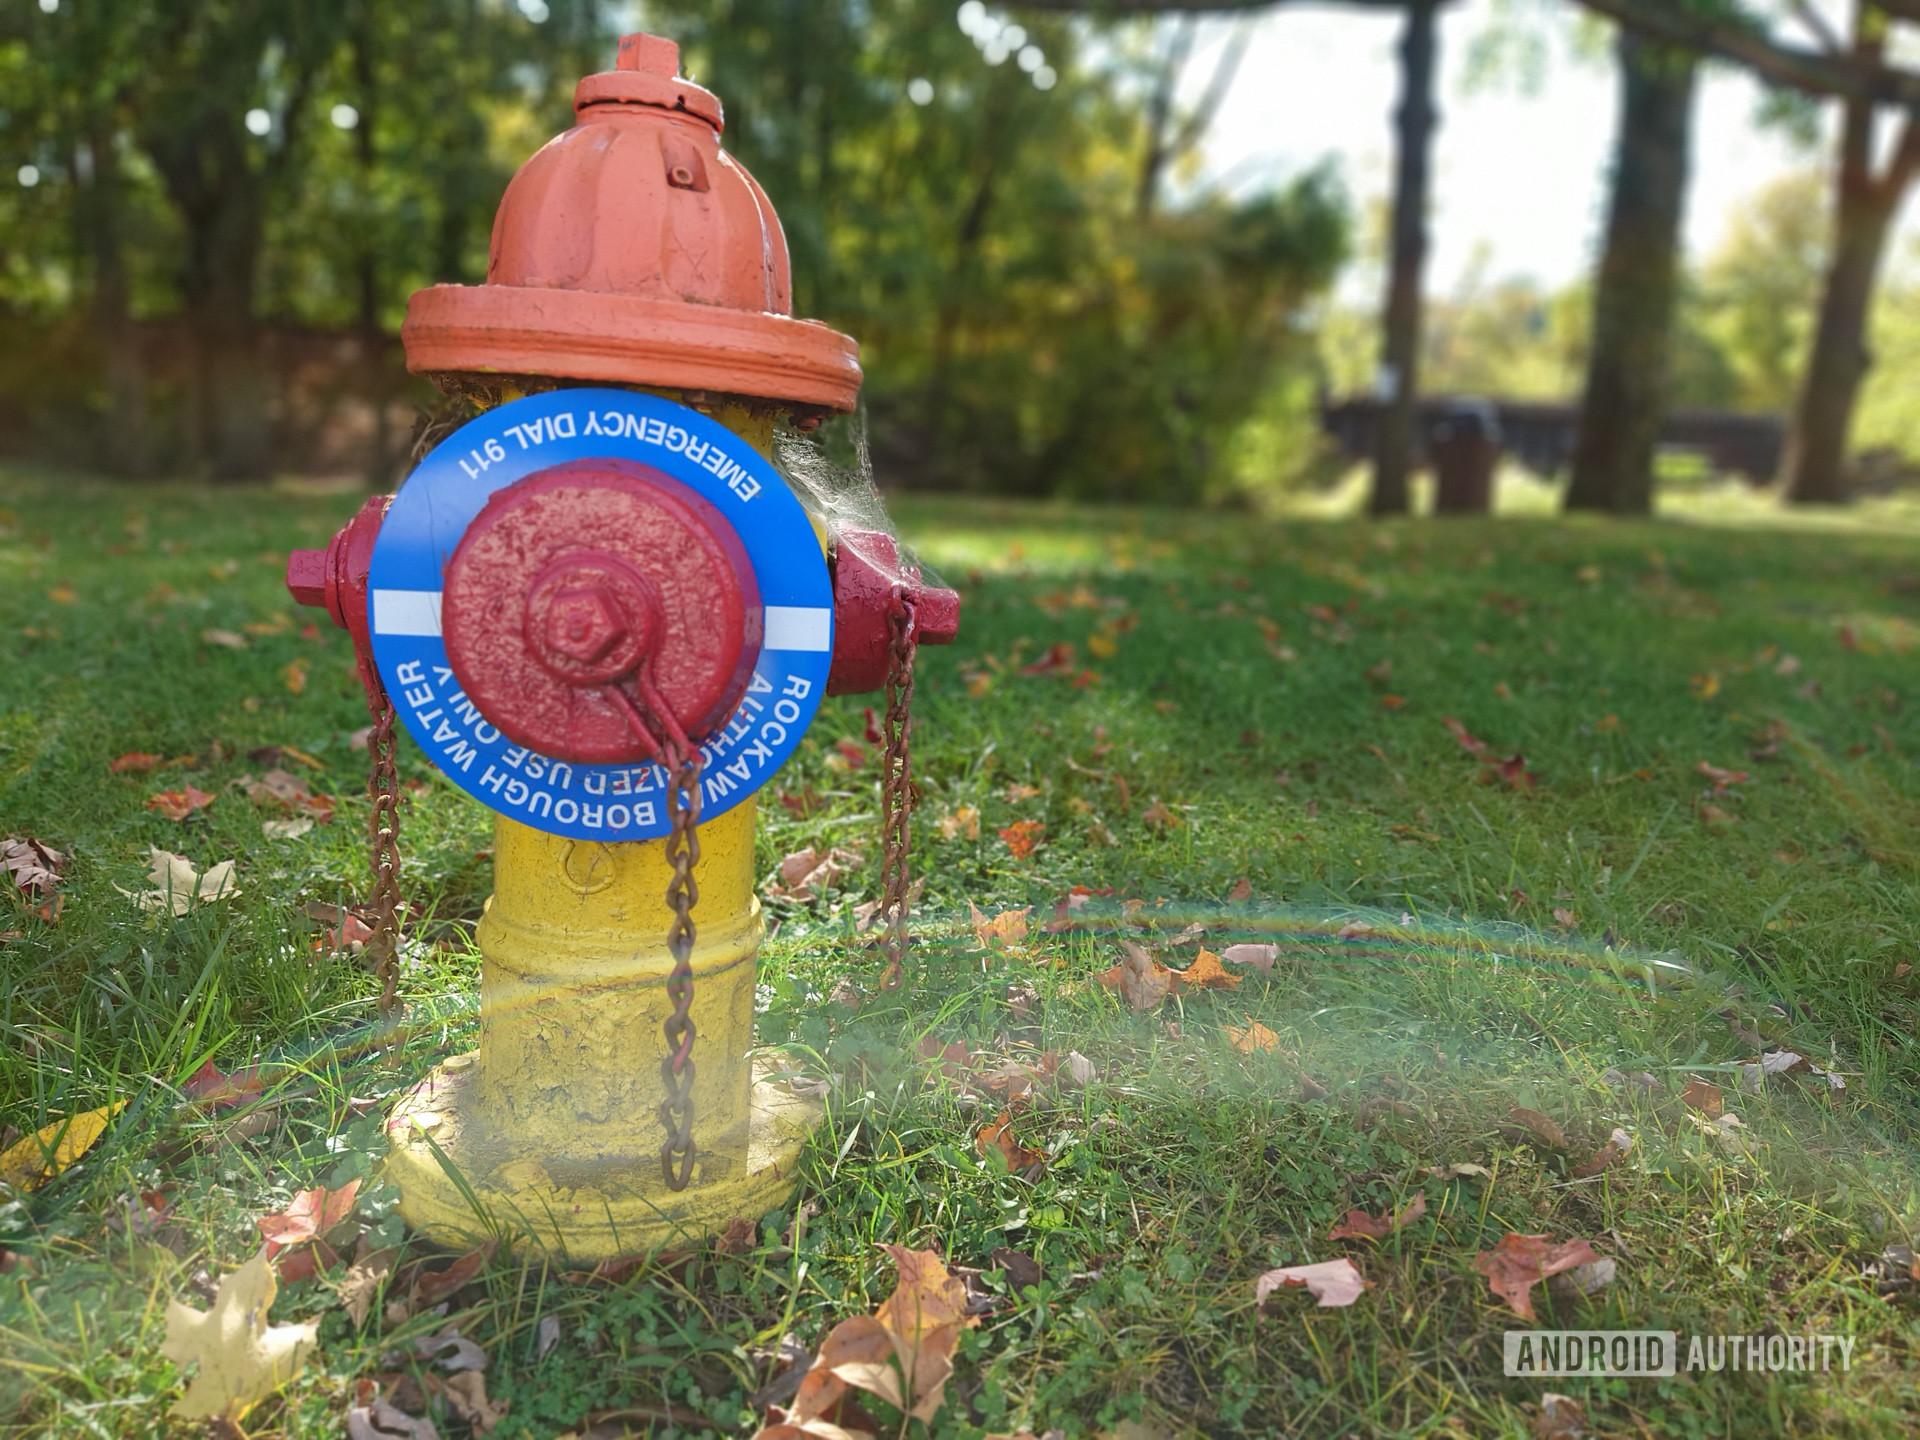 Sony Xperia 5 II photo sample hydrant